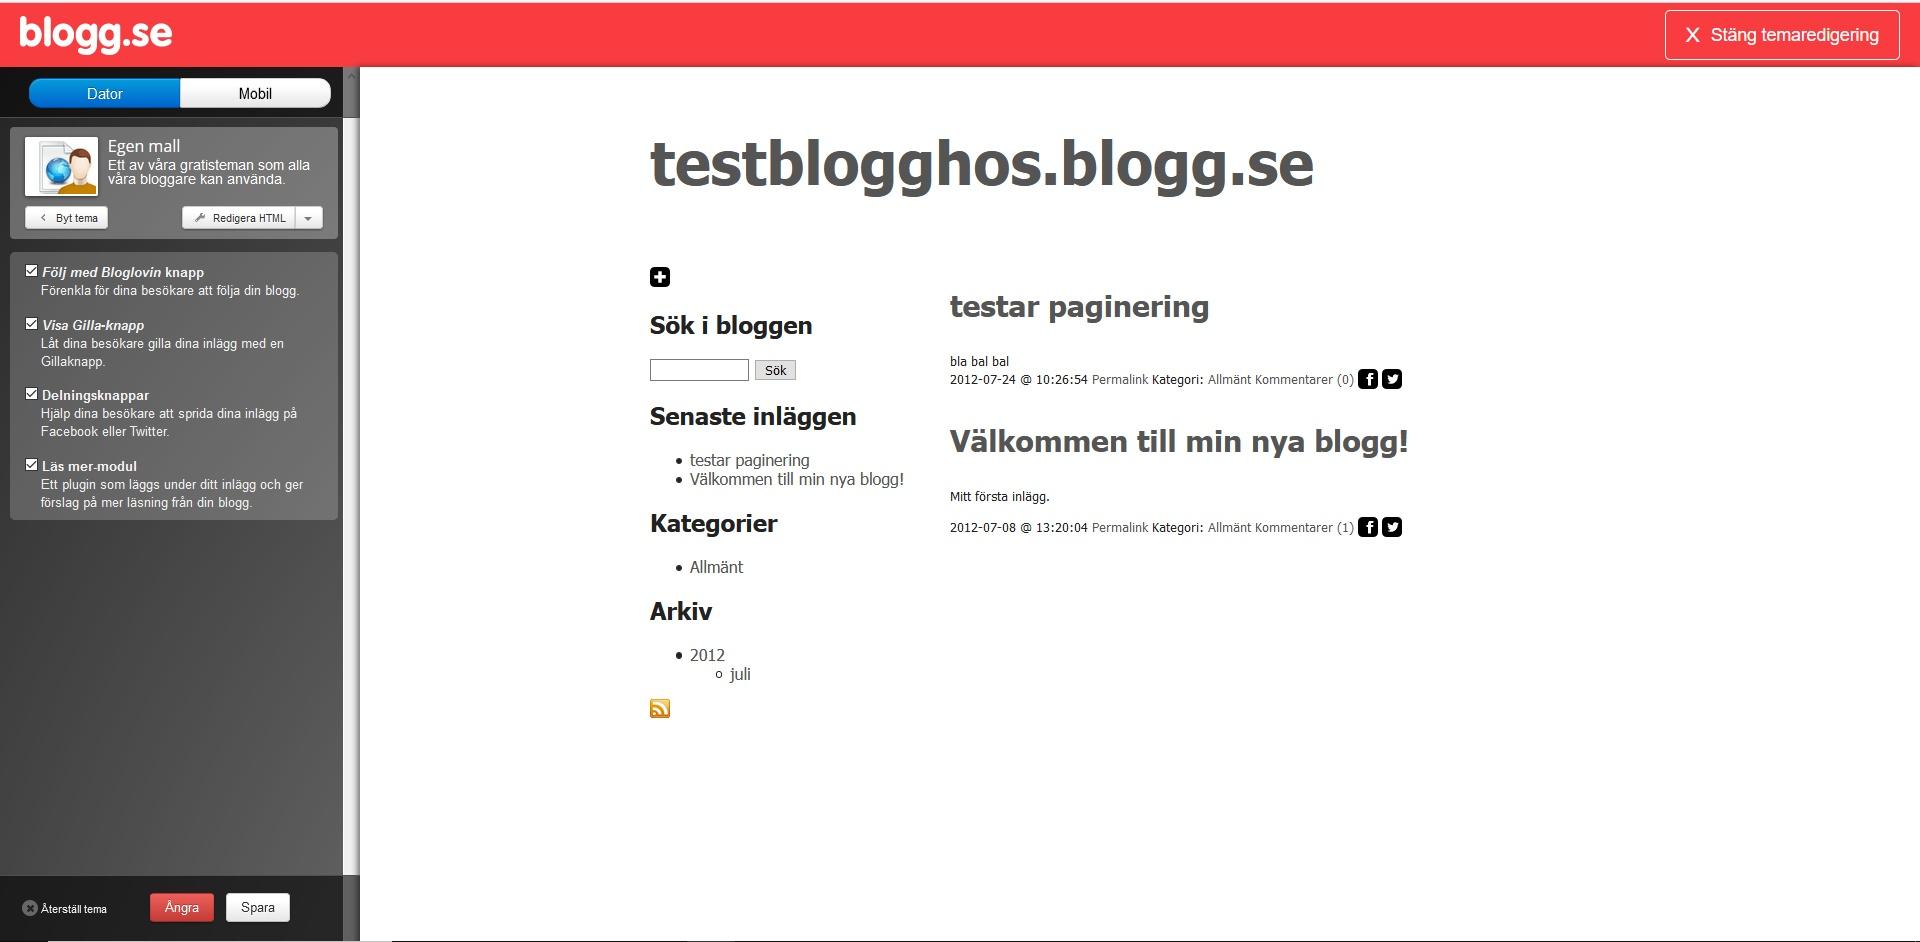 blogg.se editor. Nybörjarguide WordPress DNS SEO.